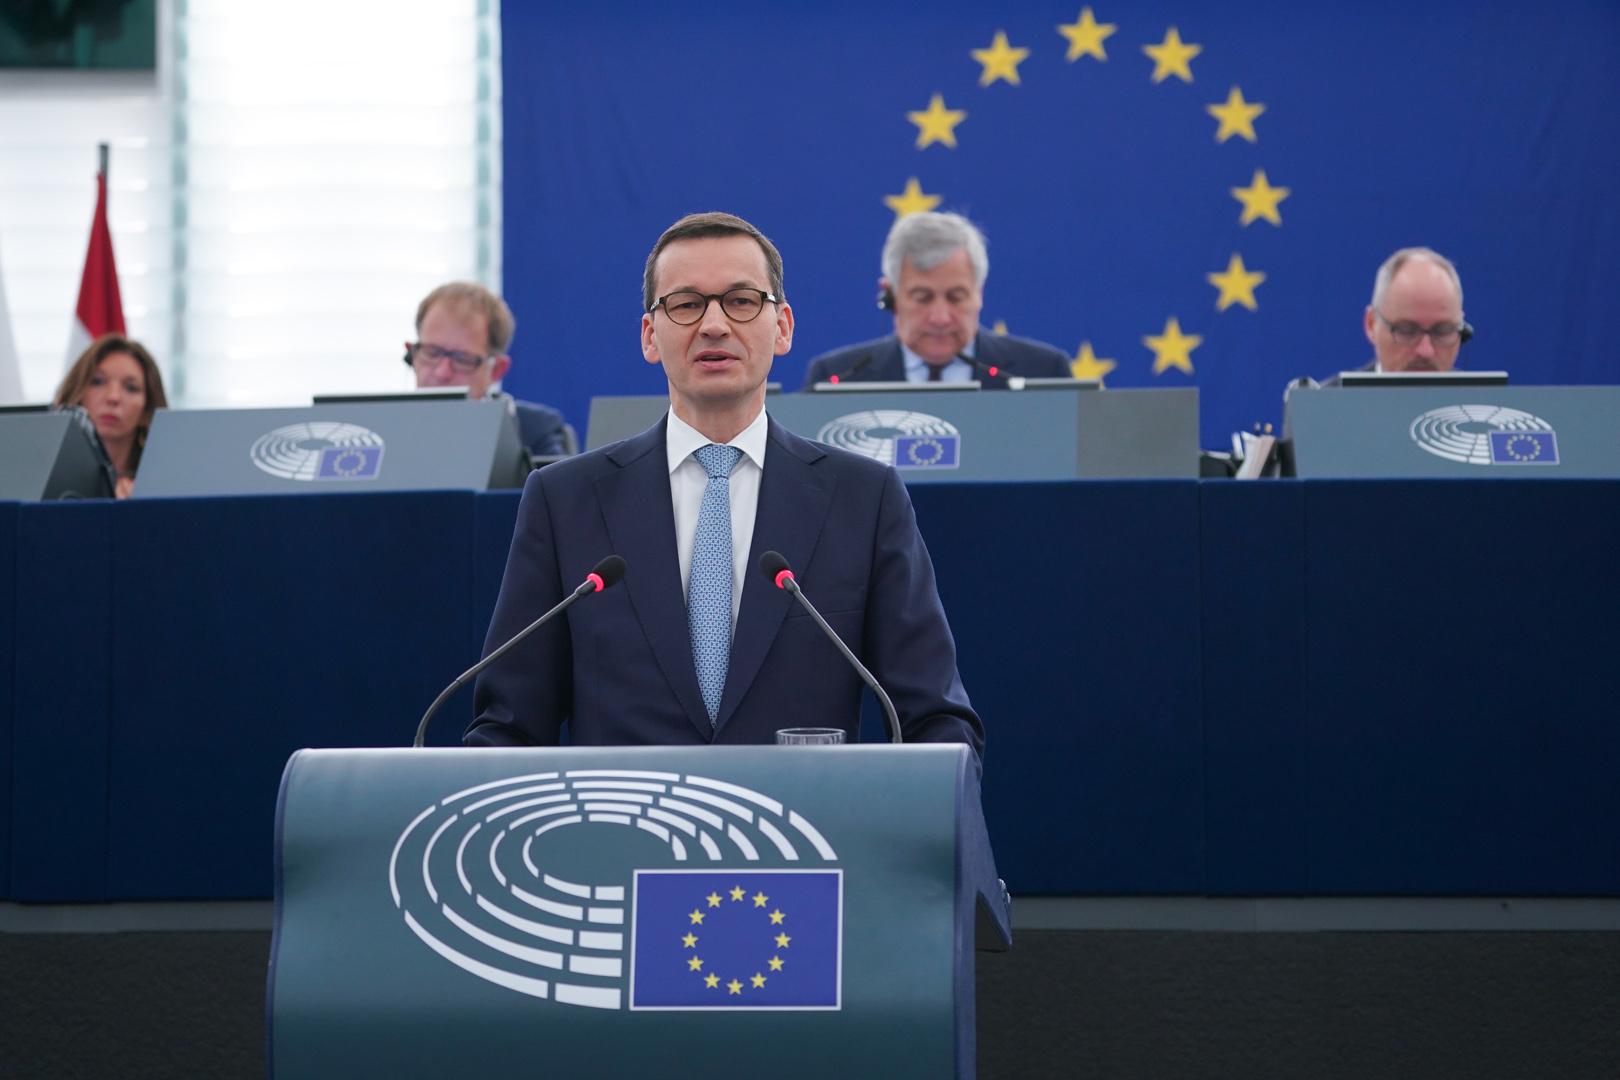 Polish Prime Minister Mateusz Morawiecki © European Parliament 2018